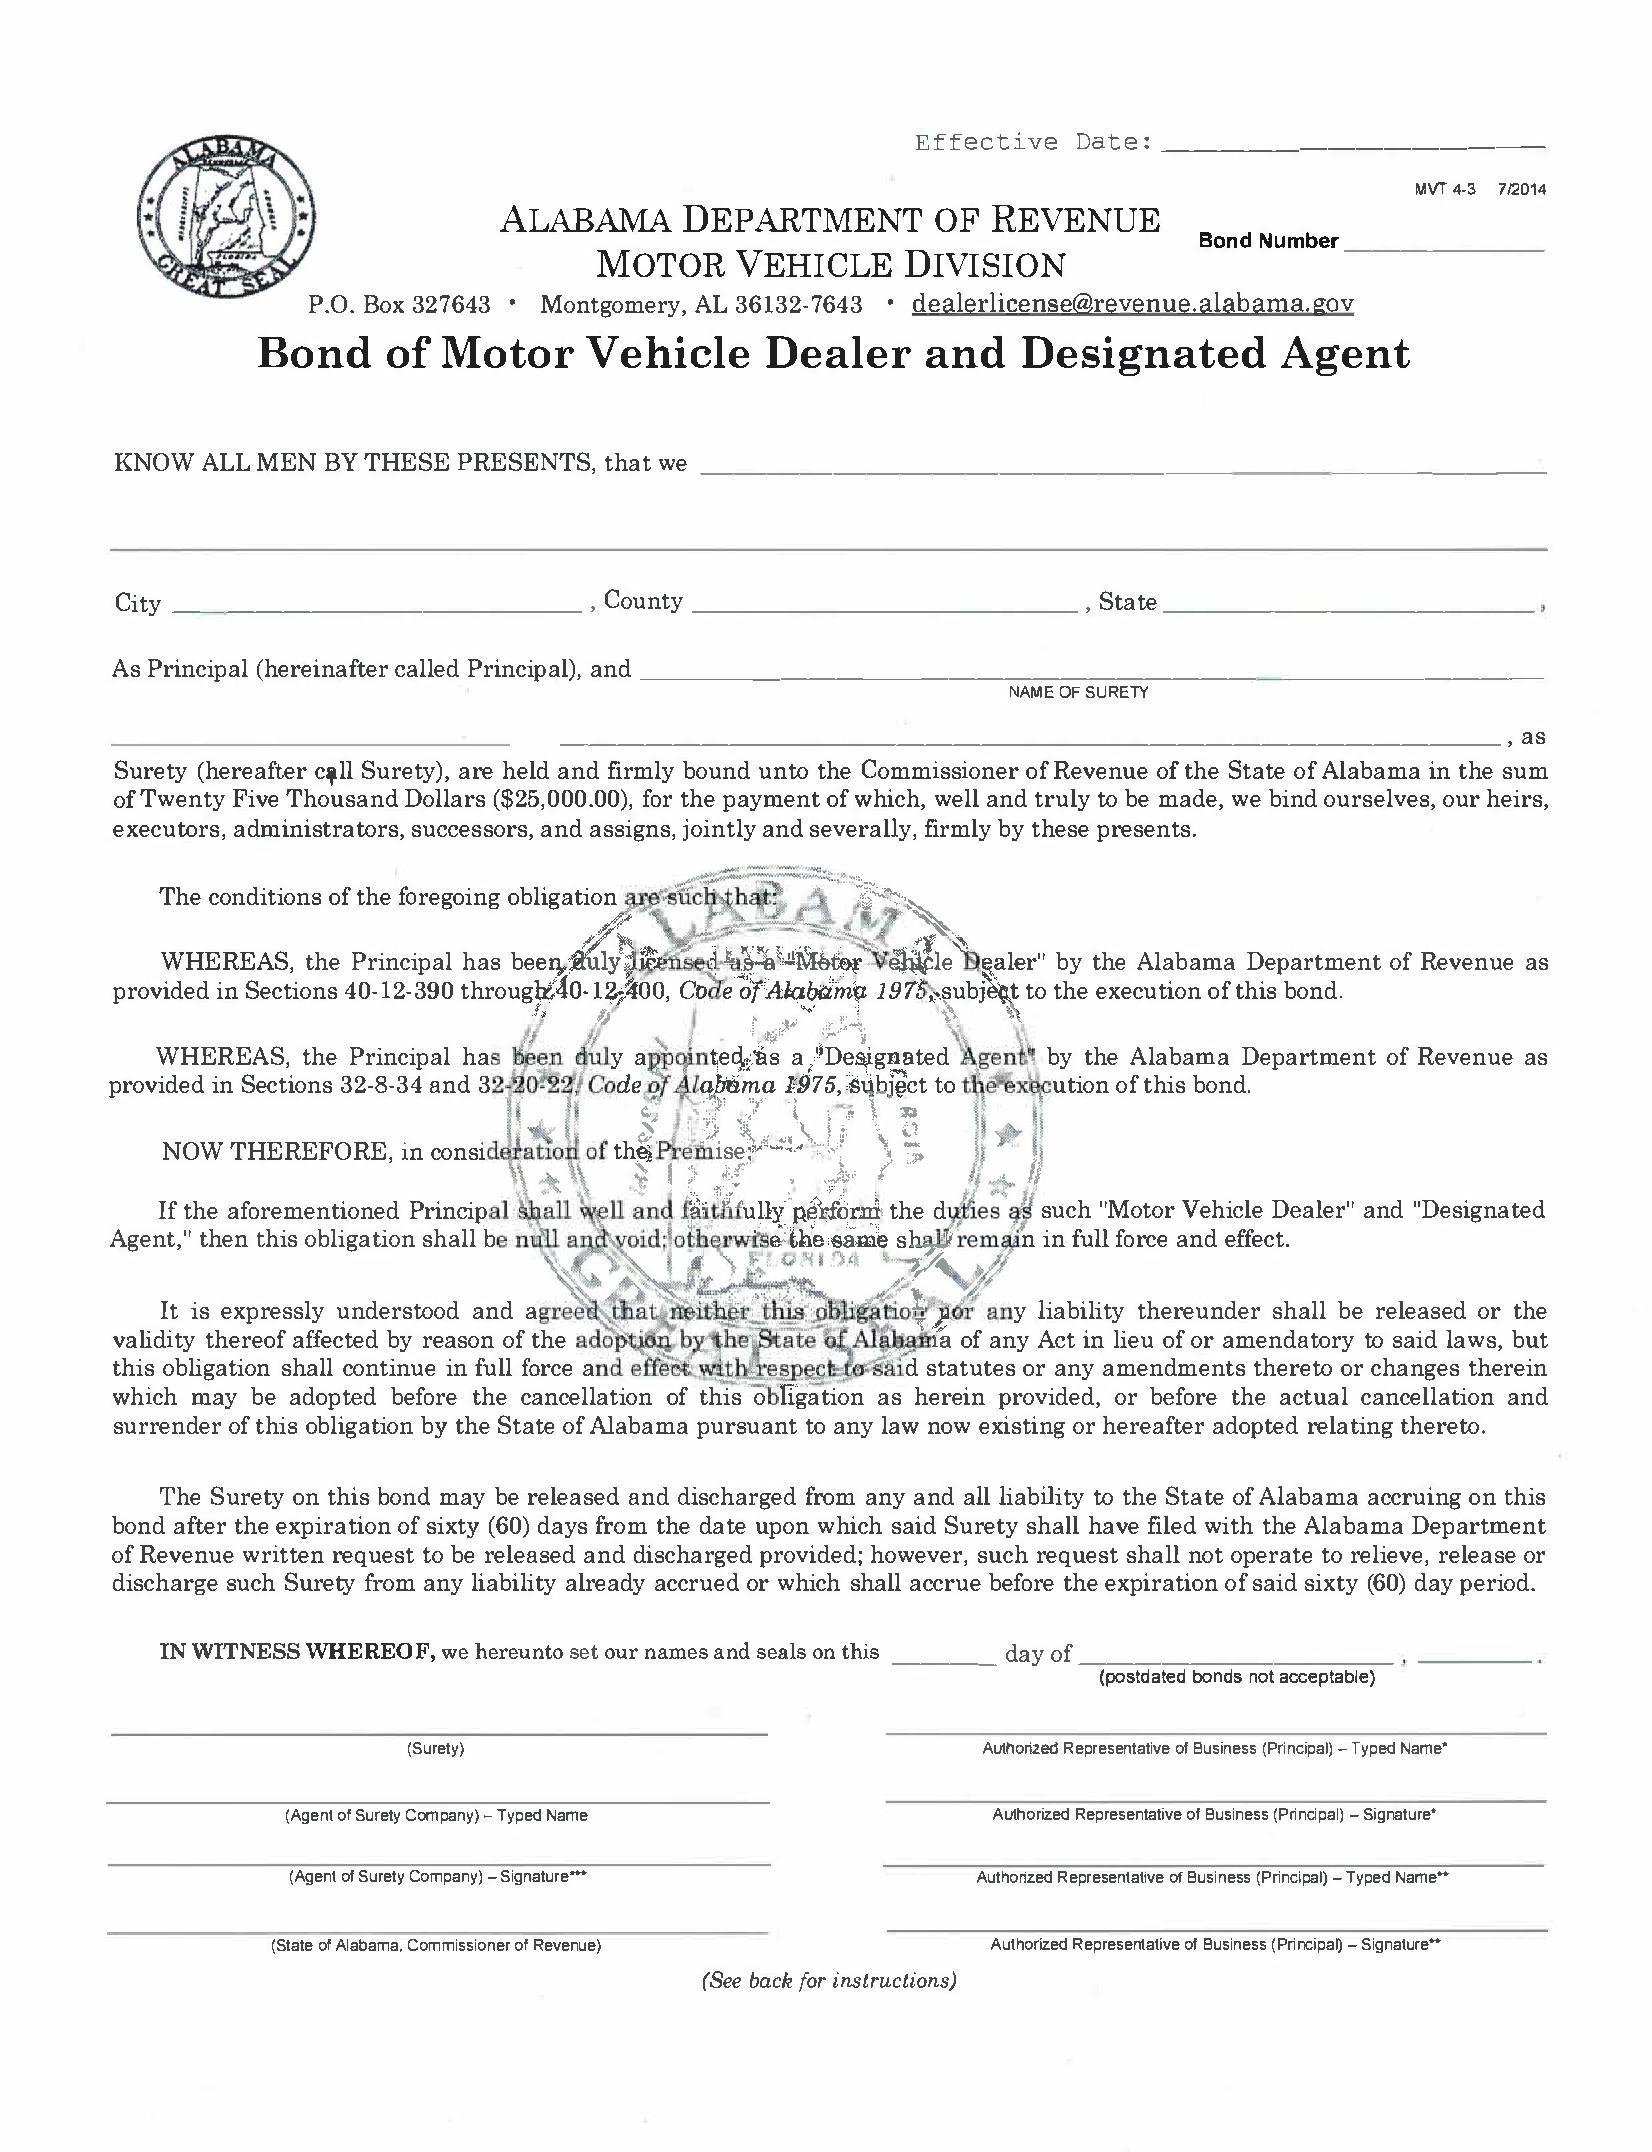 State of Alabama Motor Vehicle Dealer and Designated Agent Bond sample image